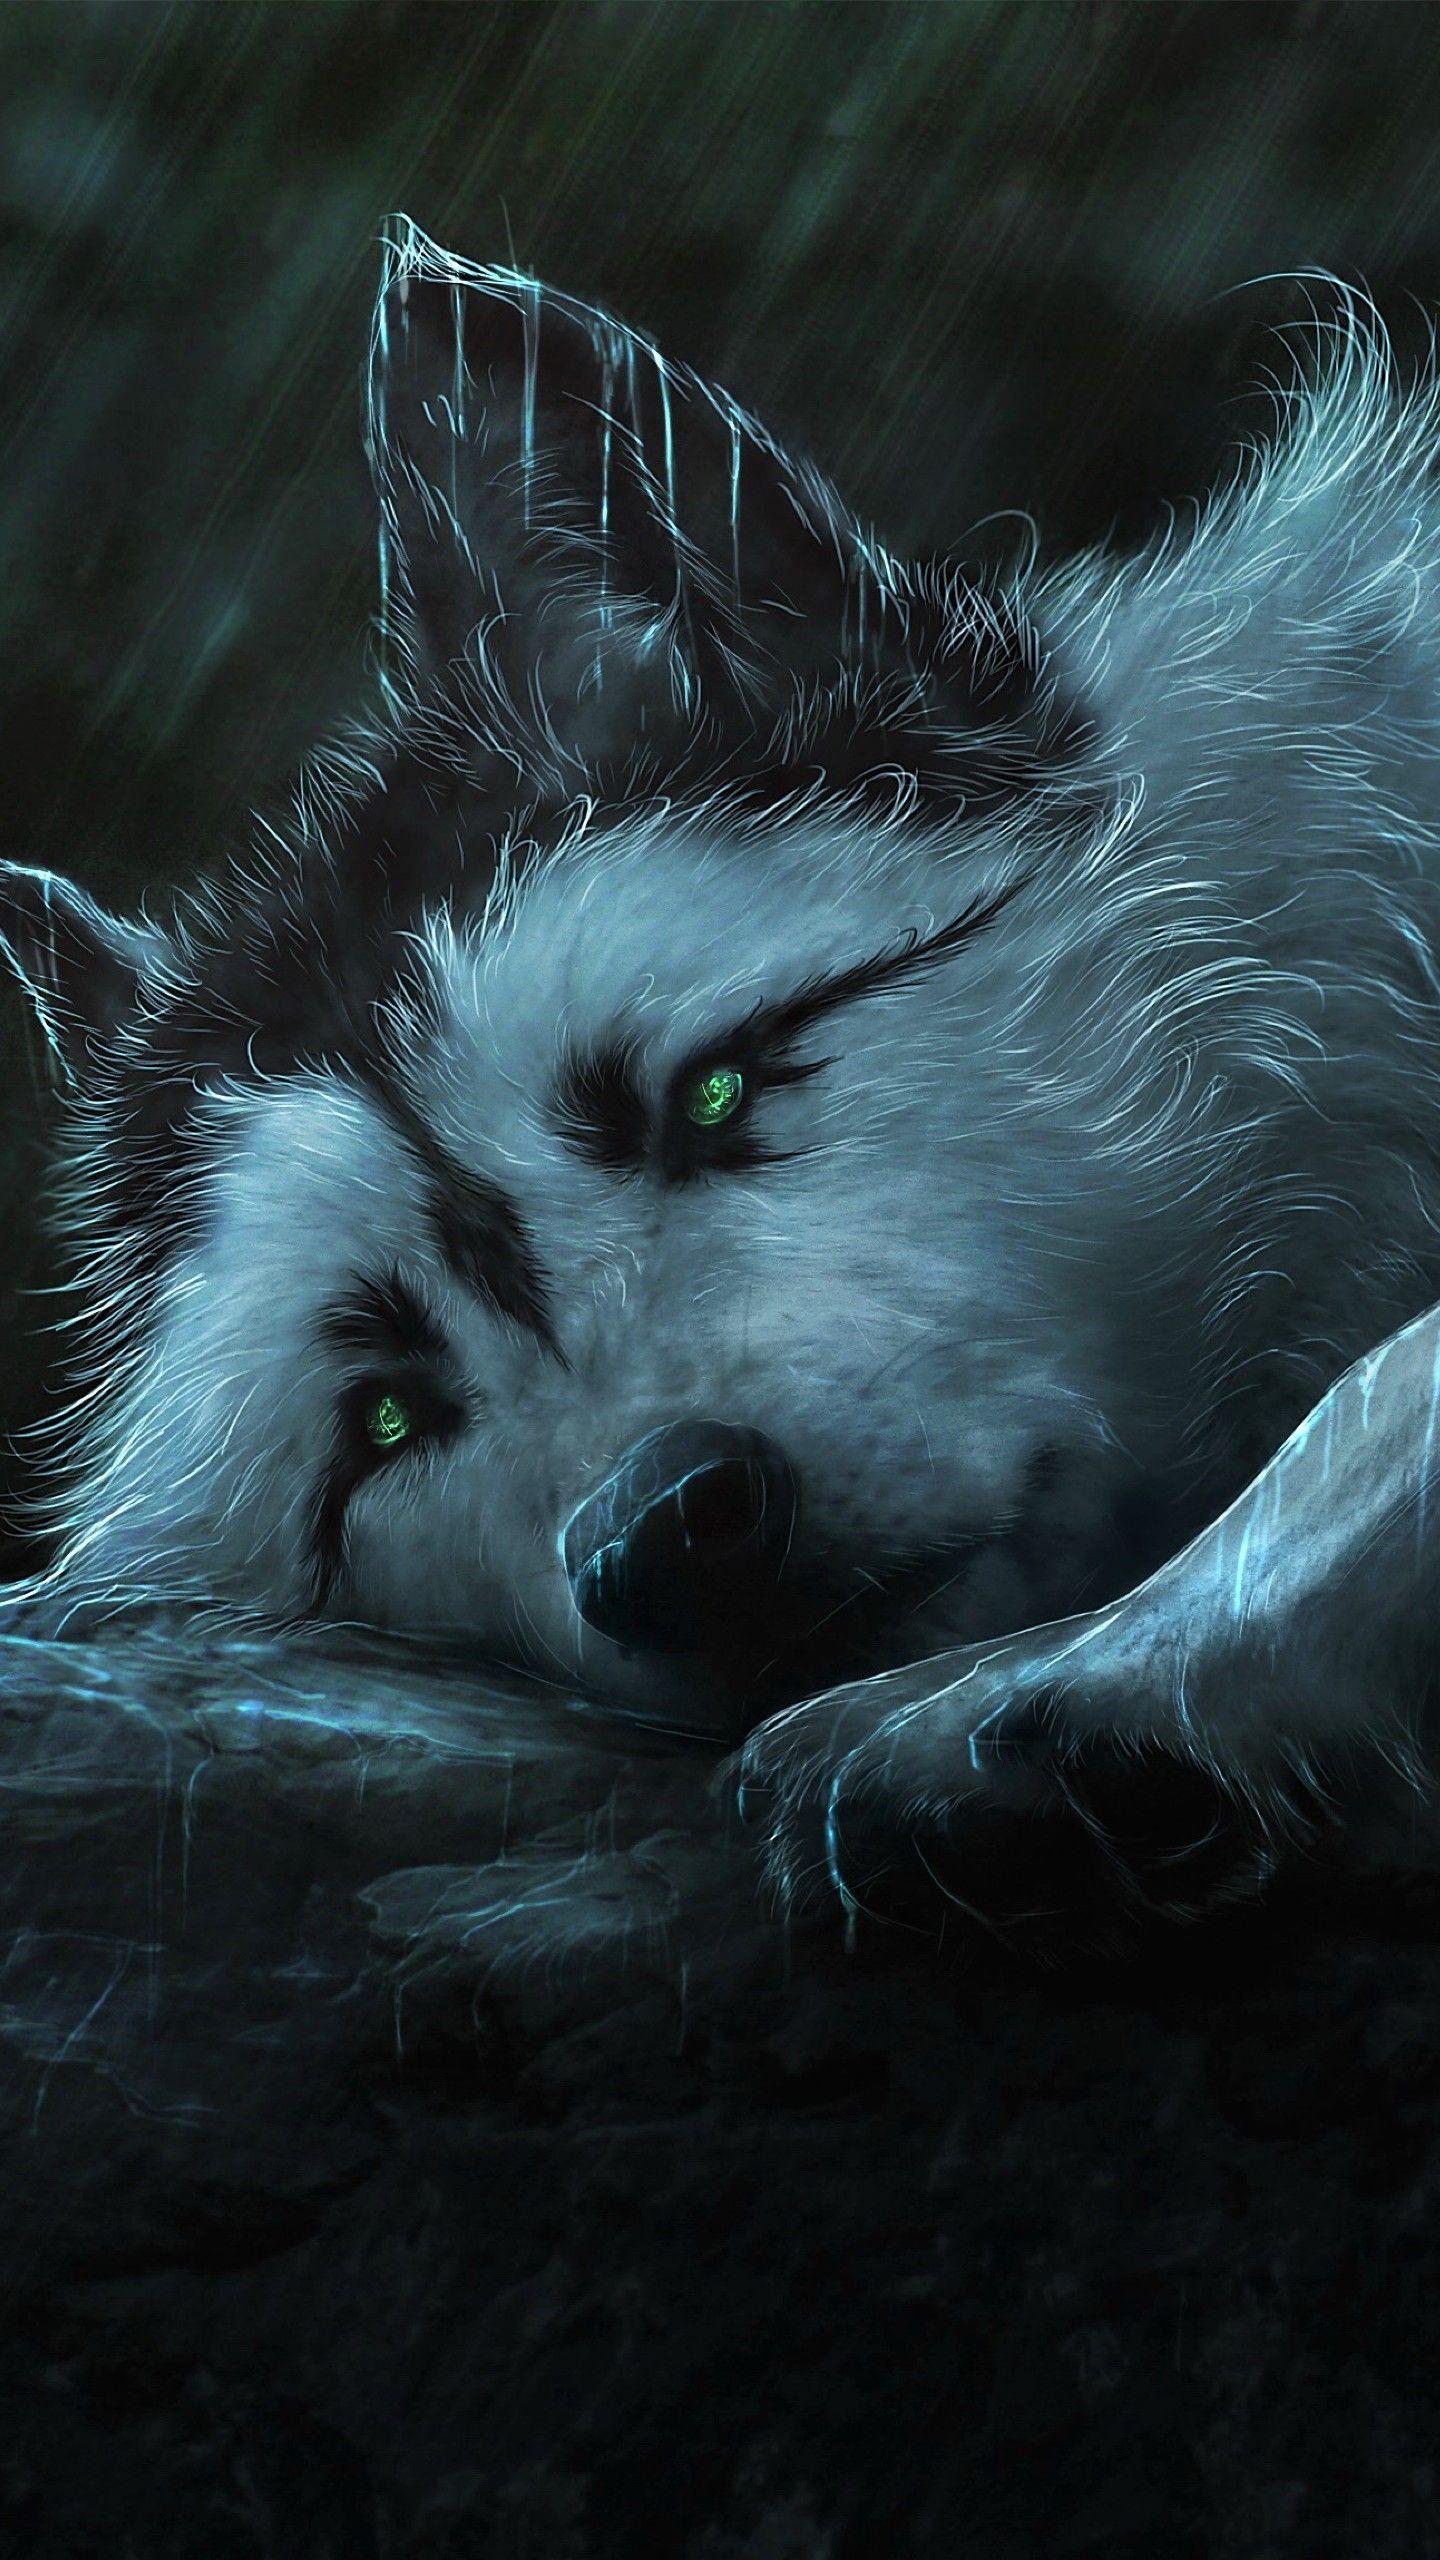 Pin by Lyrkanea on Wolf Art Wolf wallpaper, Galaxy wolf